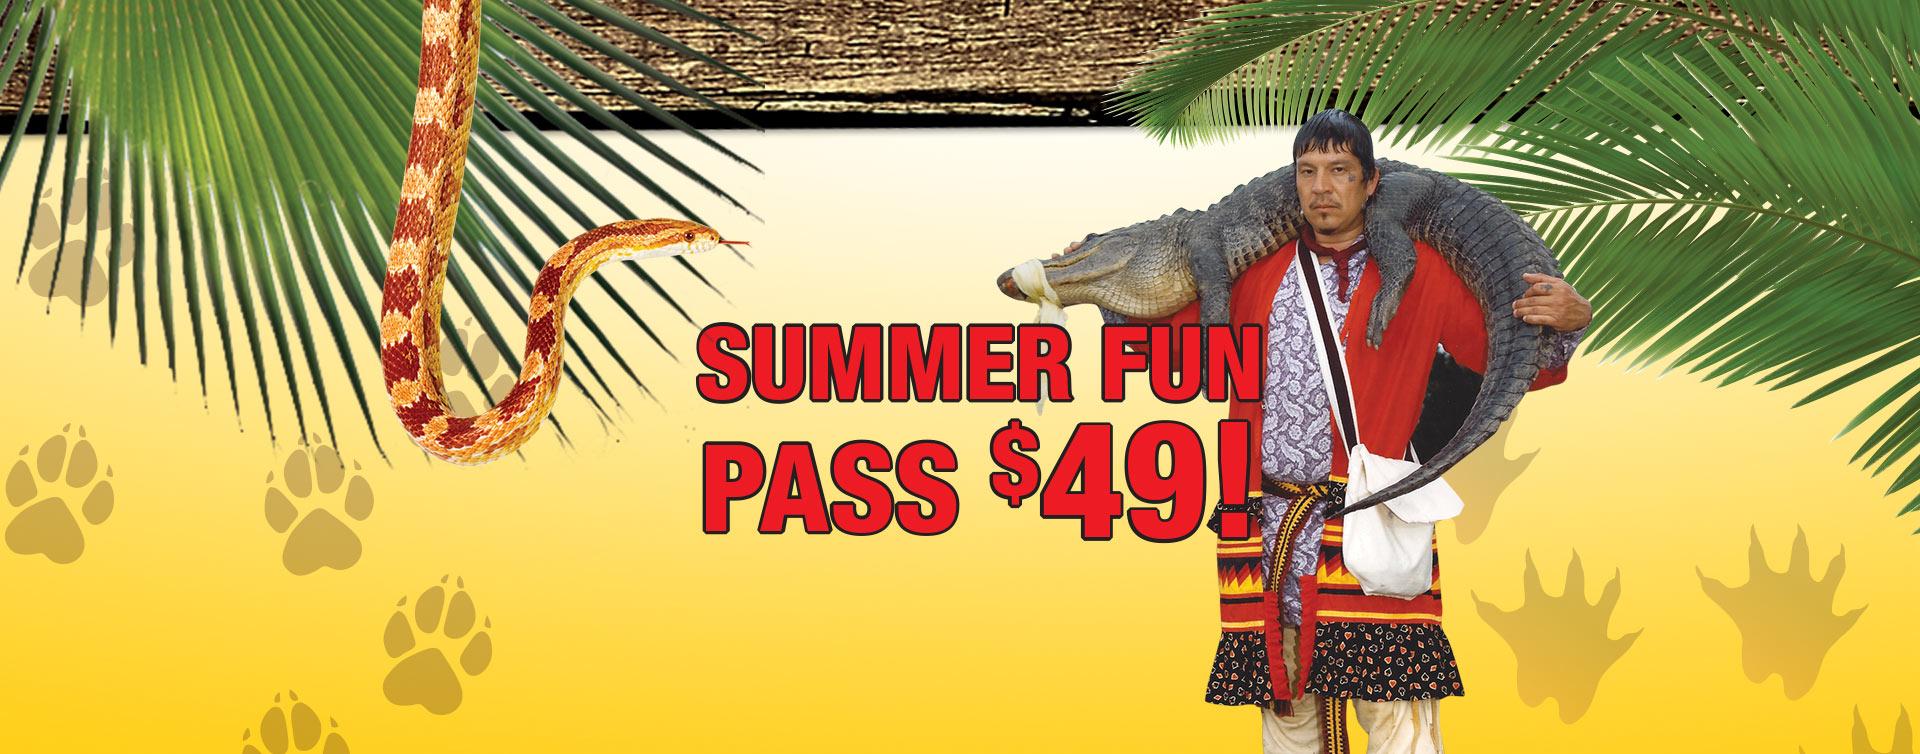 Billie Swamp Safari Summer Fun Pass